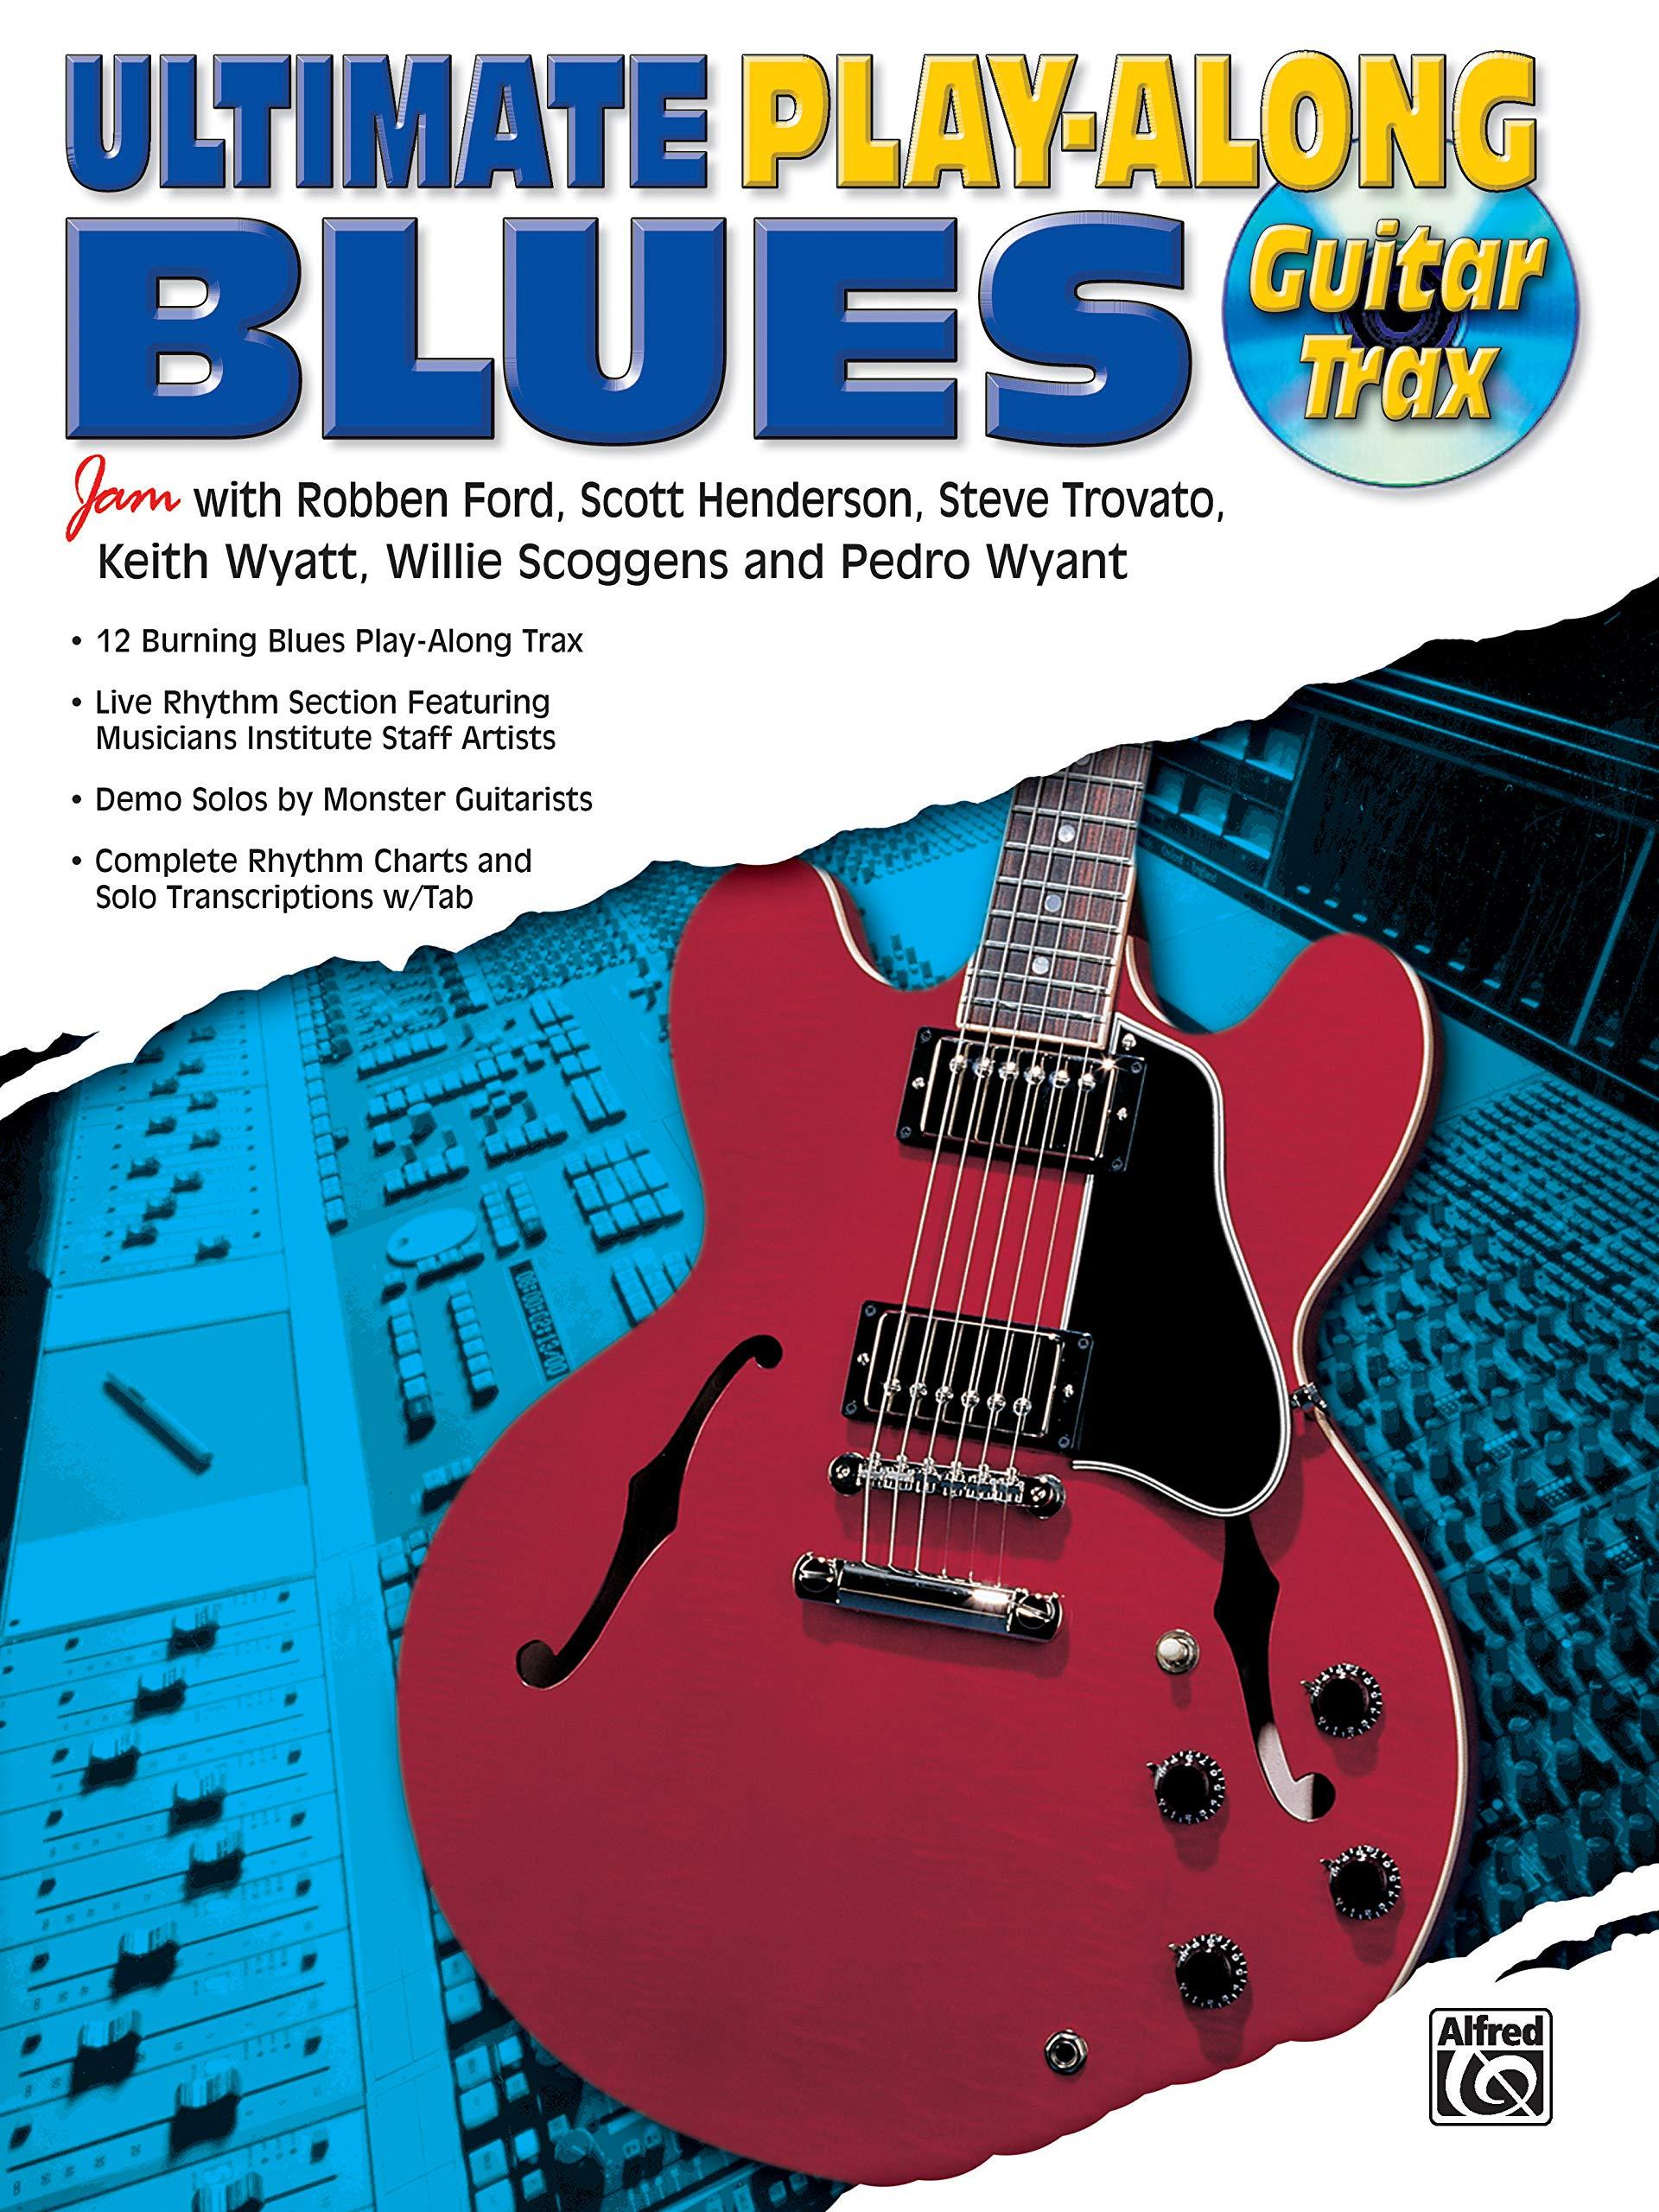 Amazon com: Ultimate Play-Along Guitar Trax Blues: Book & CD